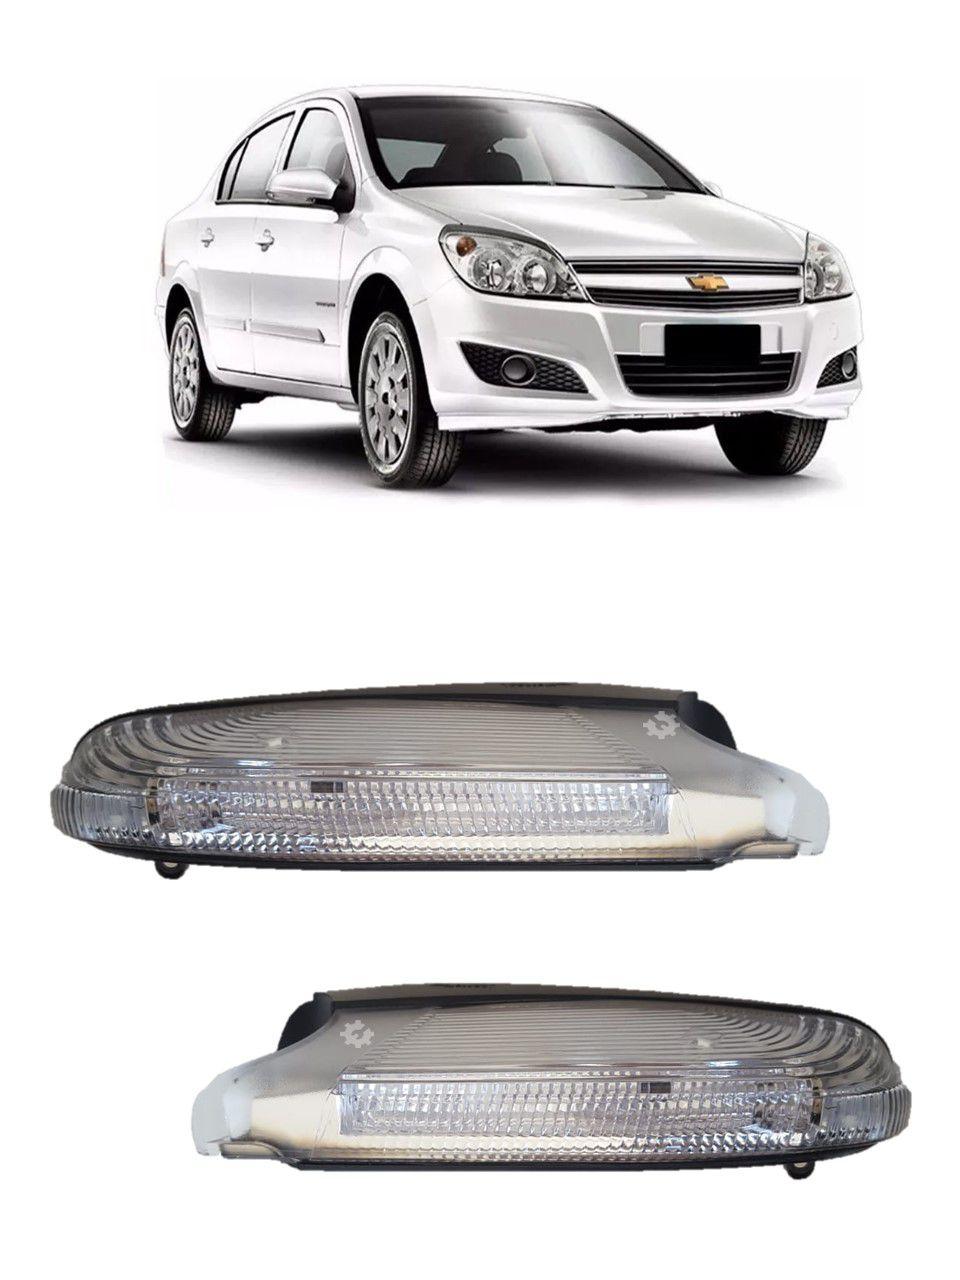 Par Pisca Retrovisor Chevrolet Vectra 2006 2008 09 2011